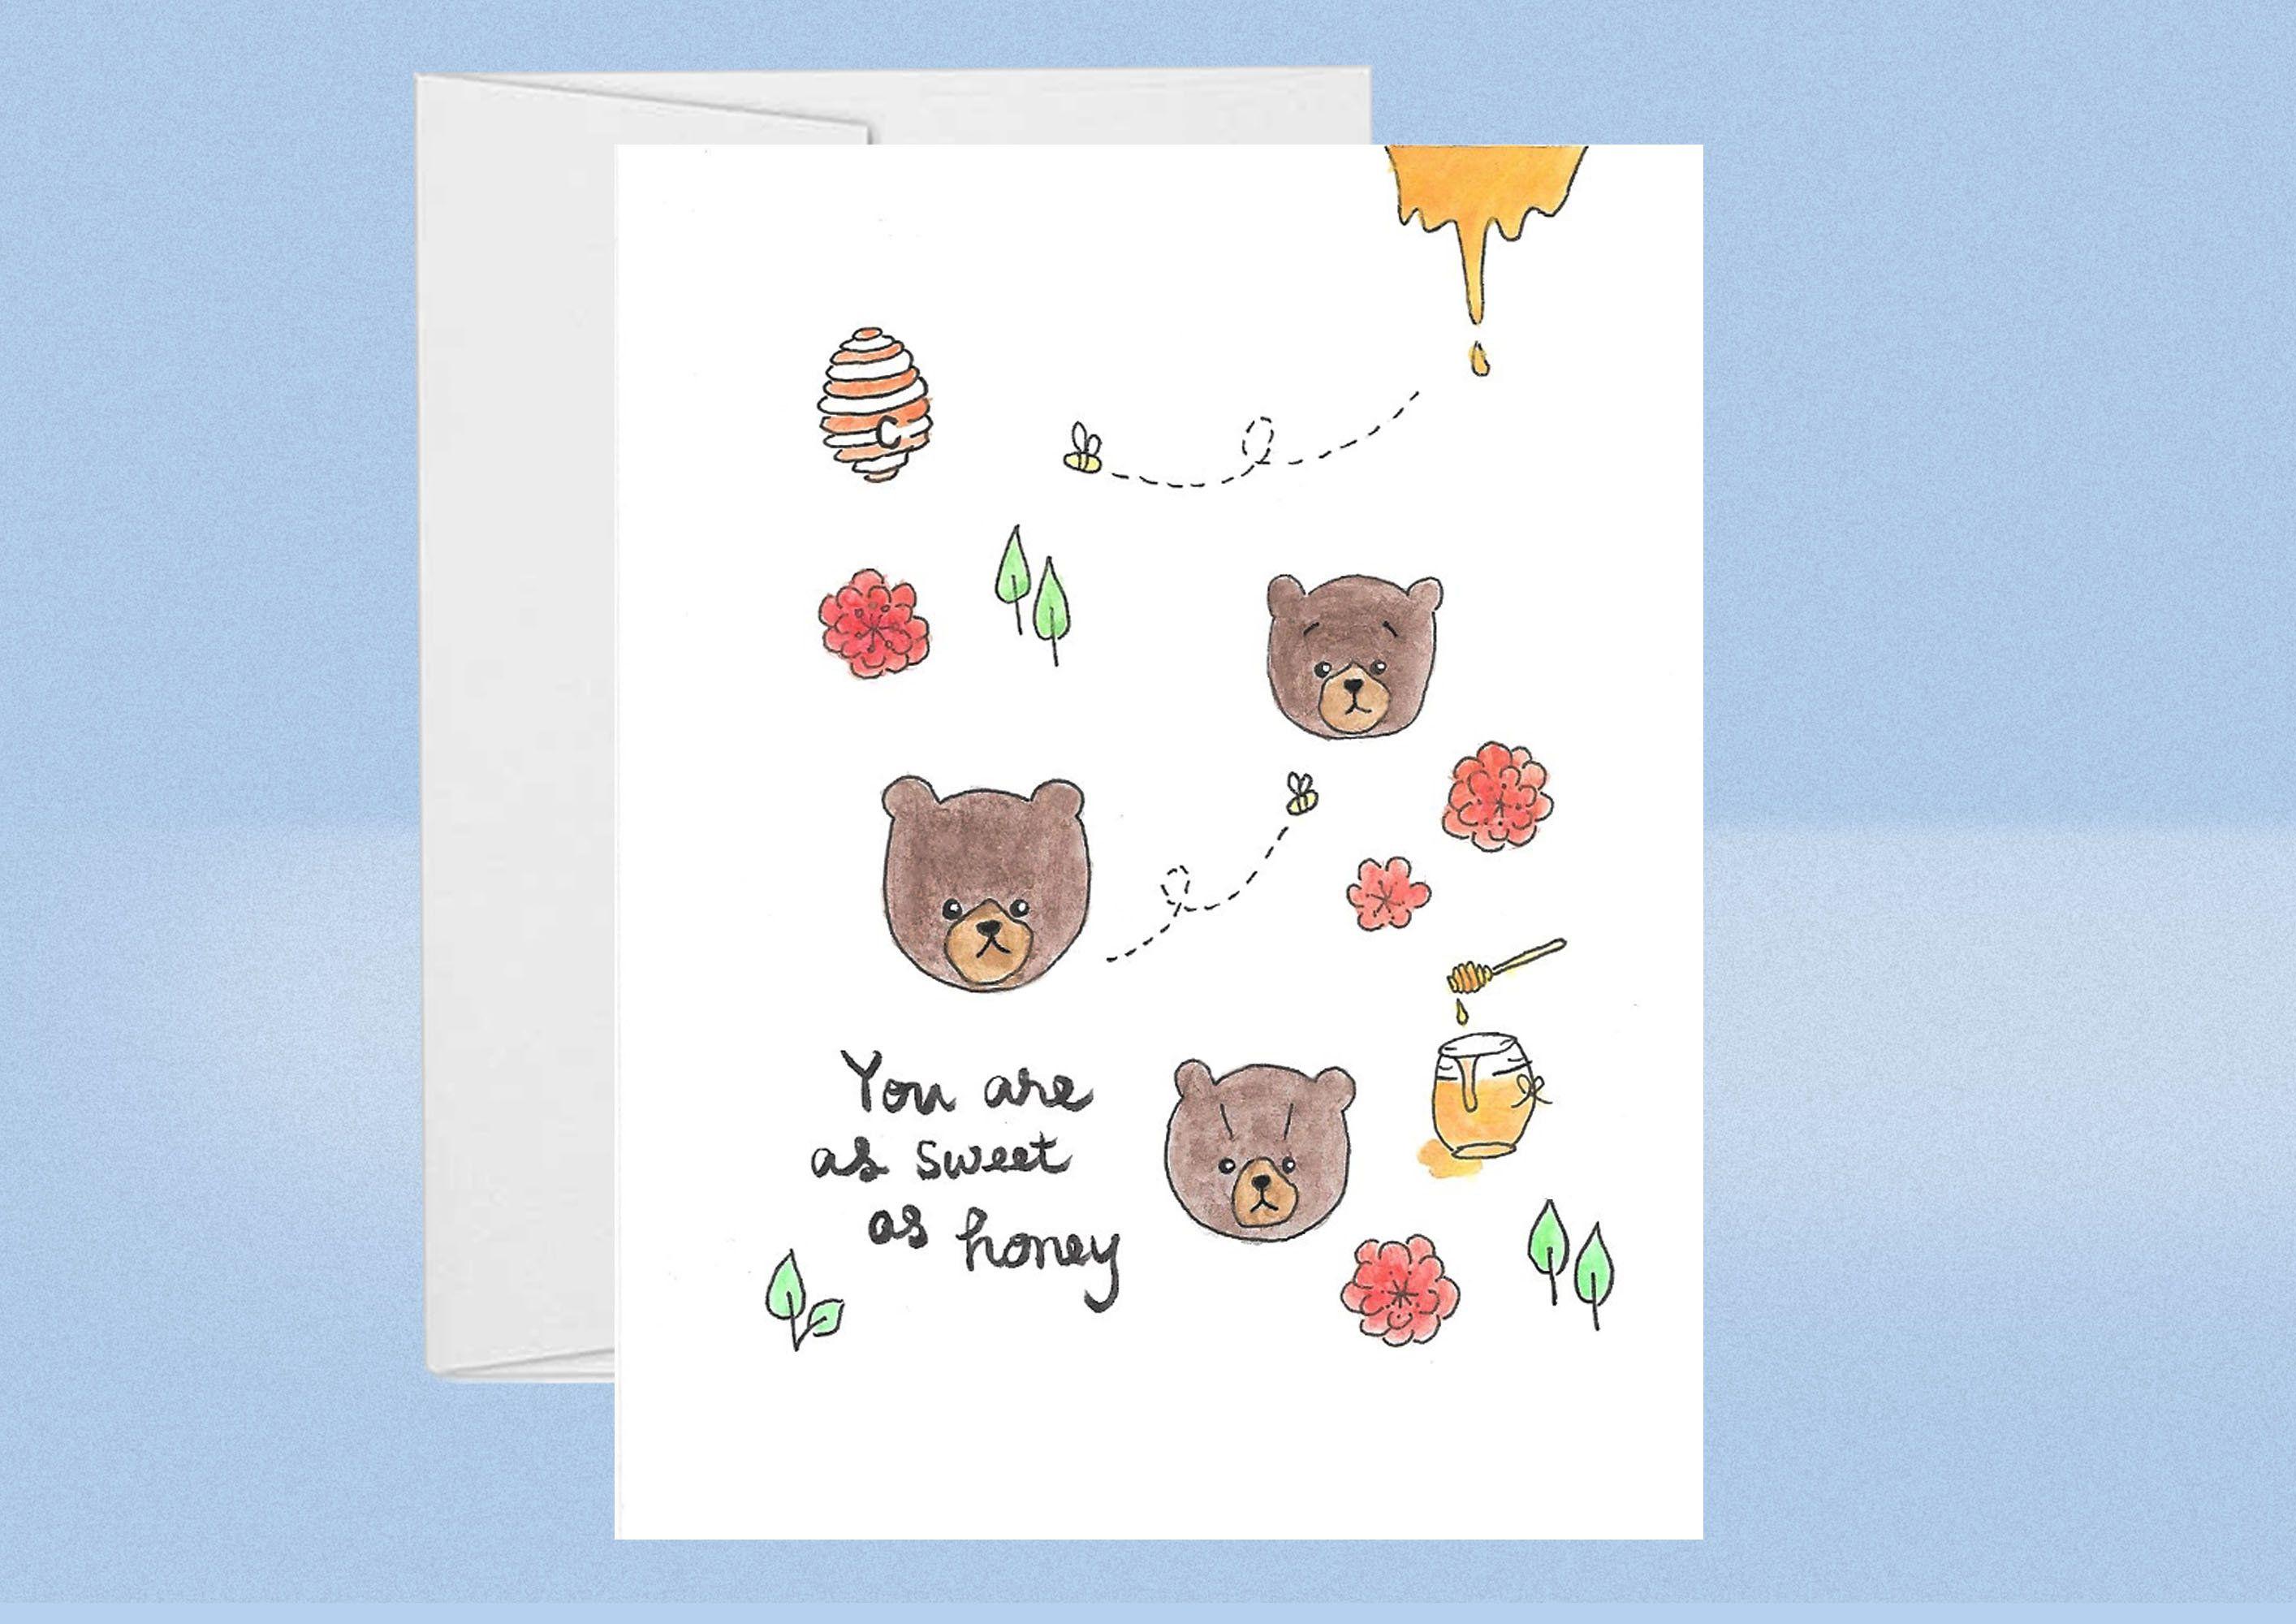 Handpainted Bear Birthday Card Etsy Anniversary Cards Handmade Cards Greeting Cards Handmade